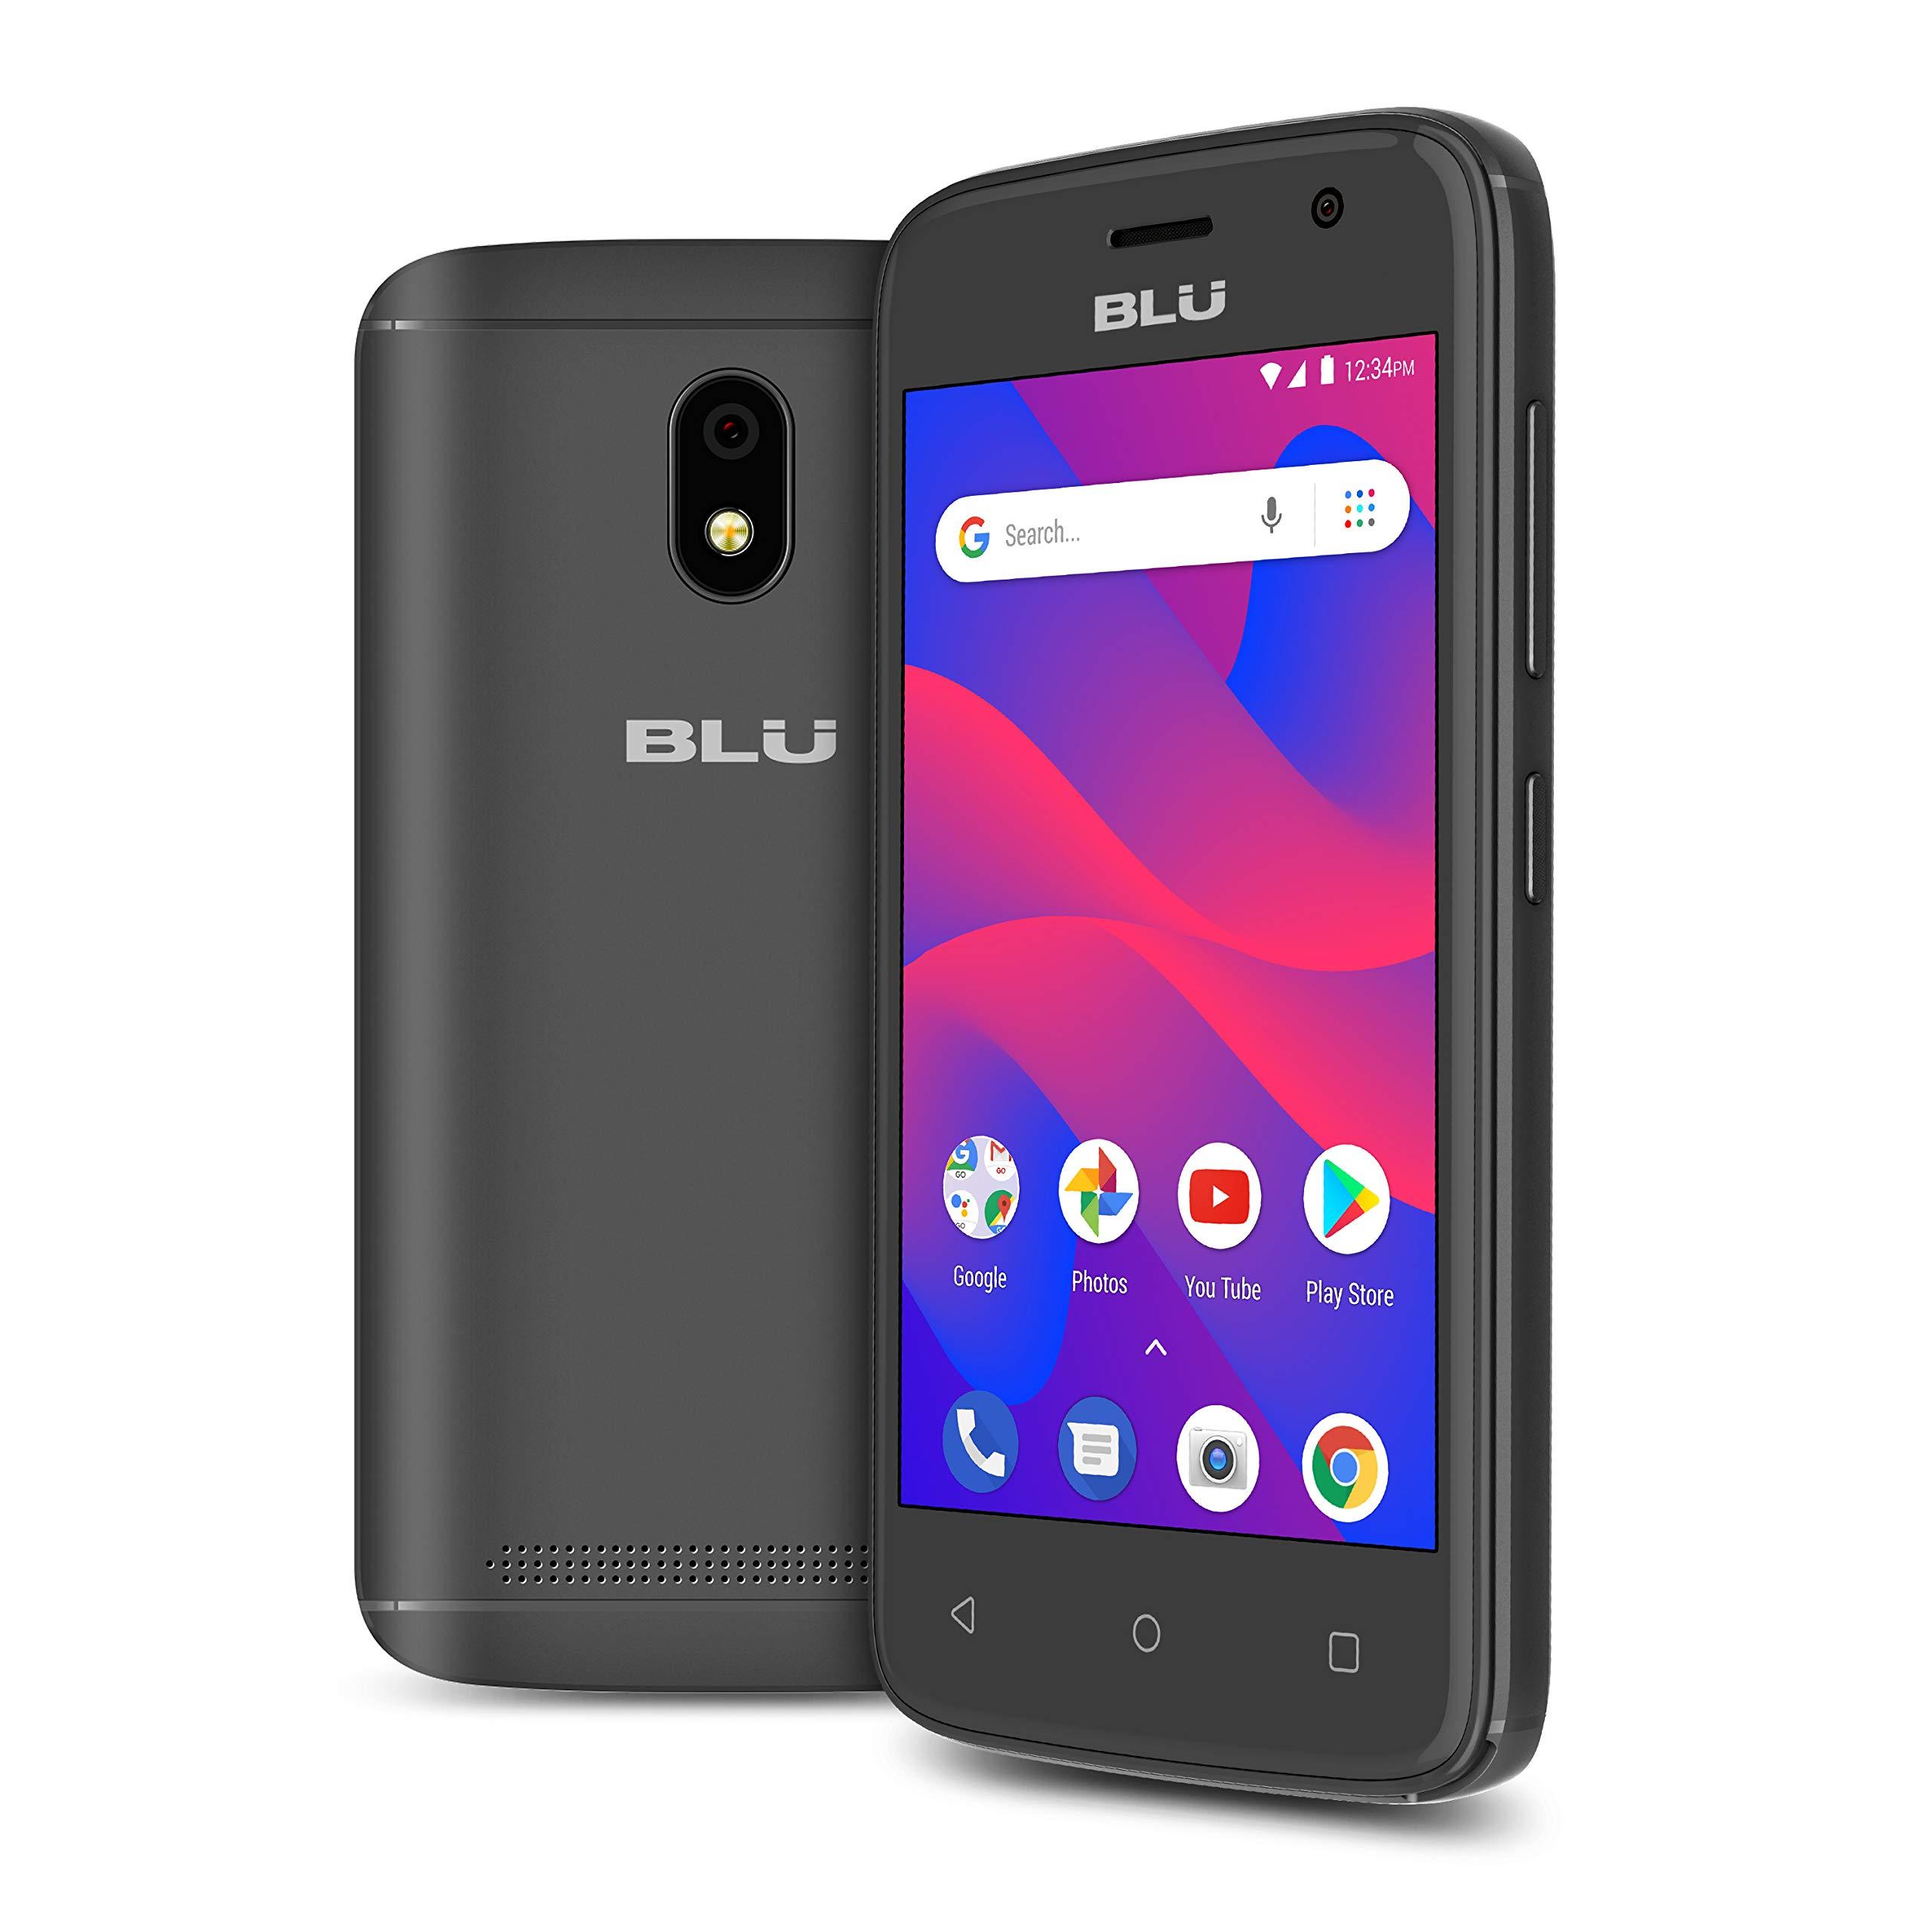 BLU Advance A4 -Unlocked Dual Sim Smartphone -Black by BLU (Image #4)